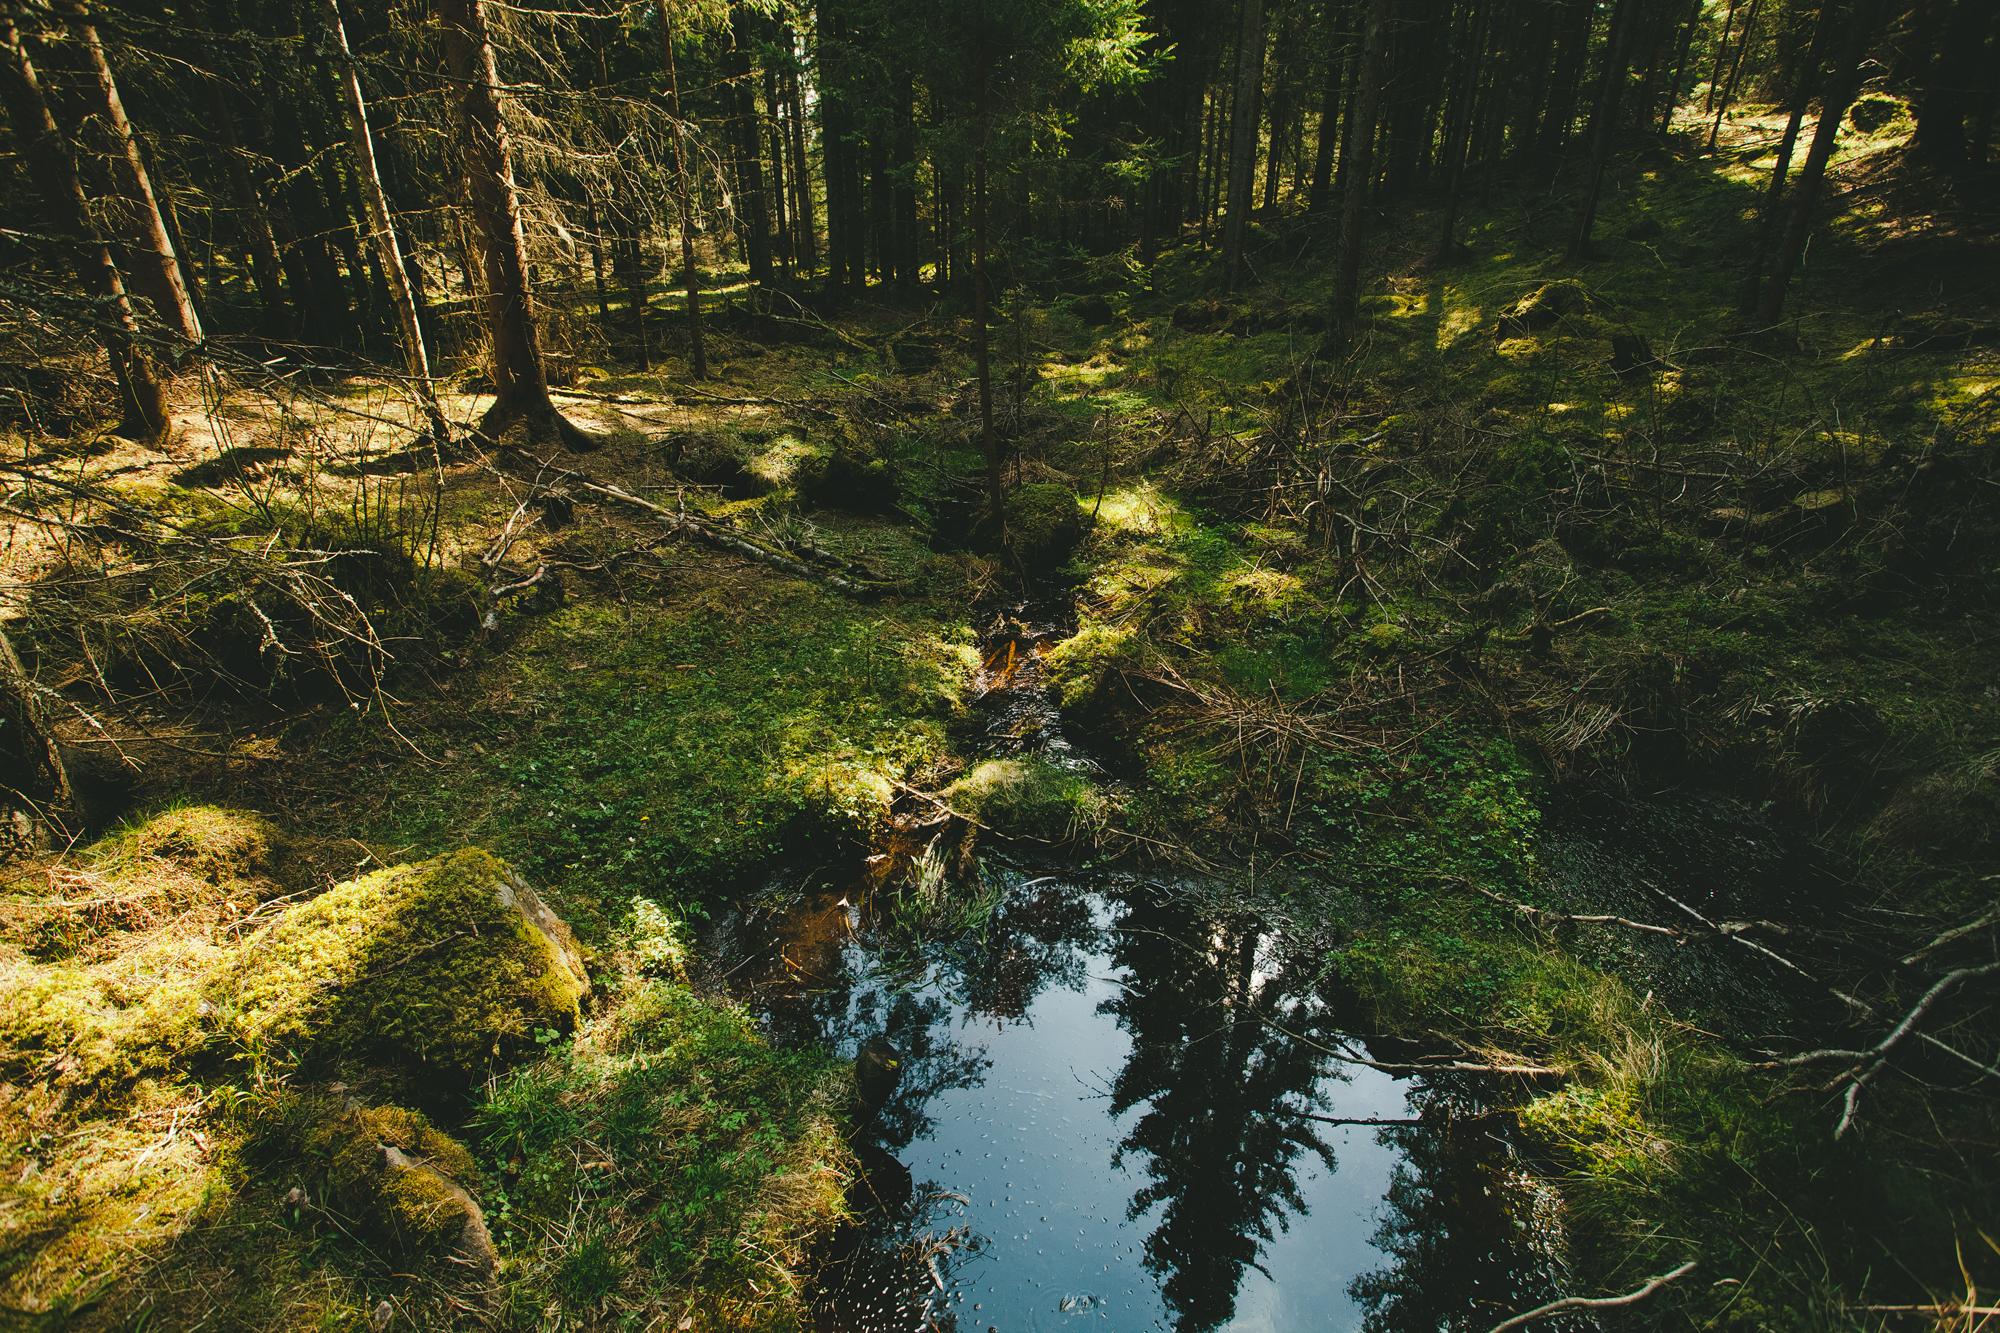 20140419_Erland_0461e-reflective-pool_IT.jpg